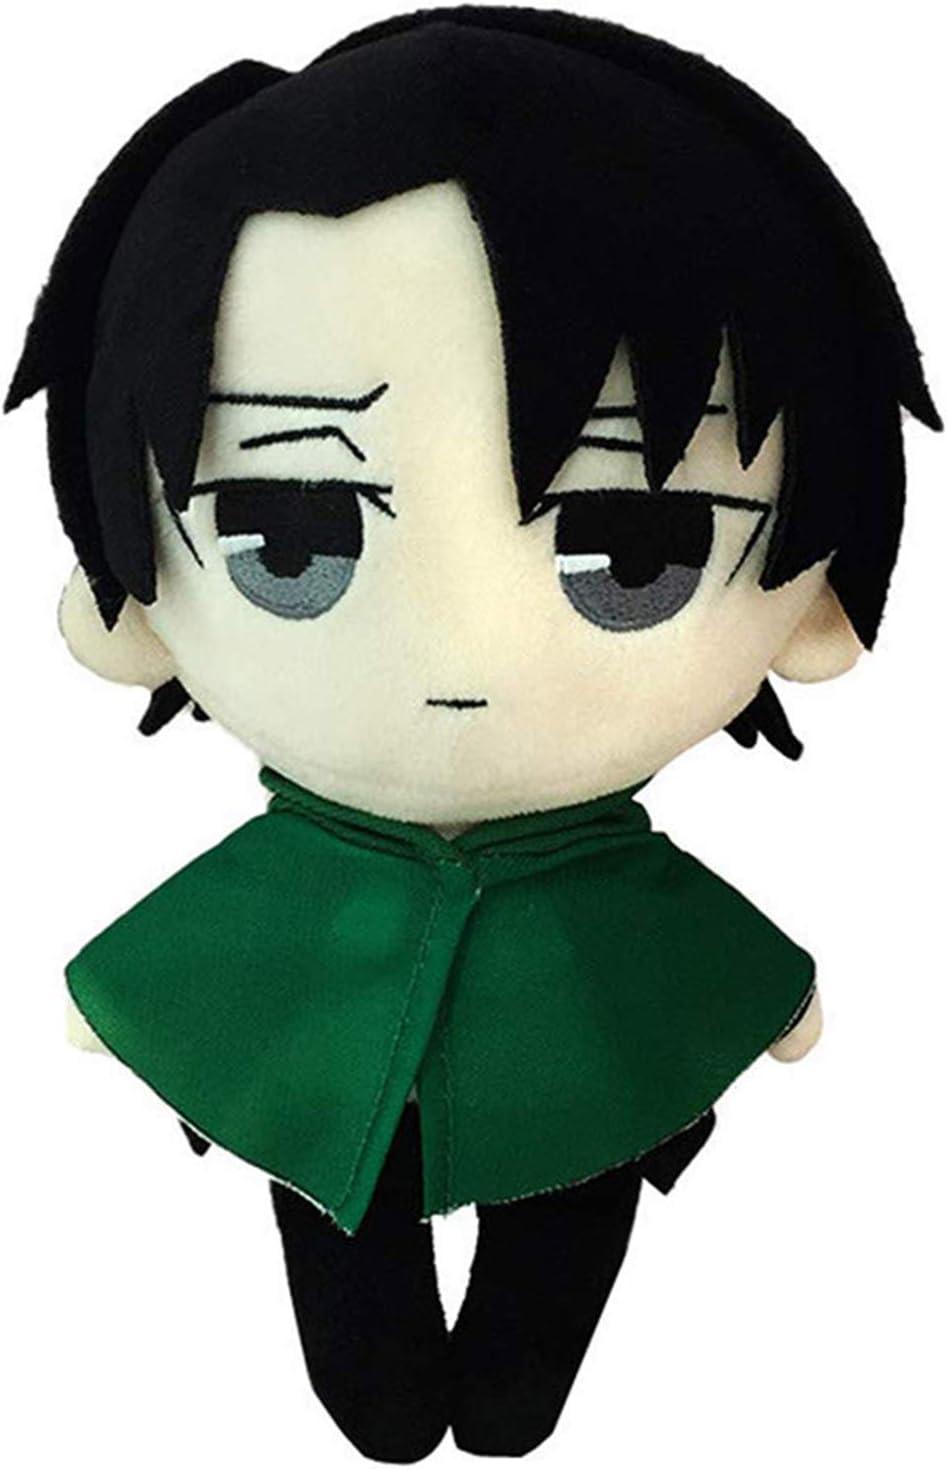 Wasoie Levi Financial sales sale Ackerman Plush Figure In a popularity Anime Cartoon Doll Toy Stuffed